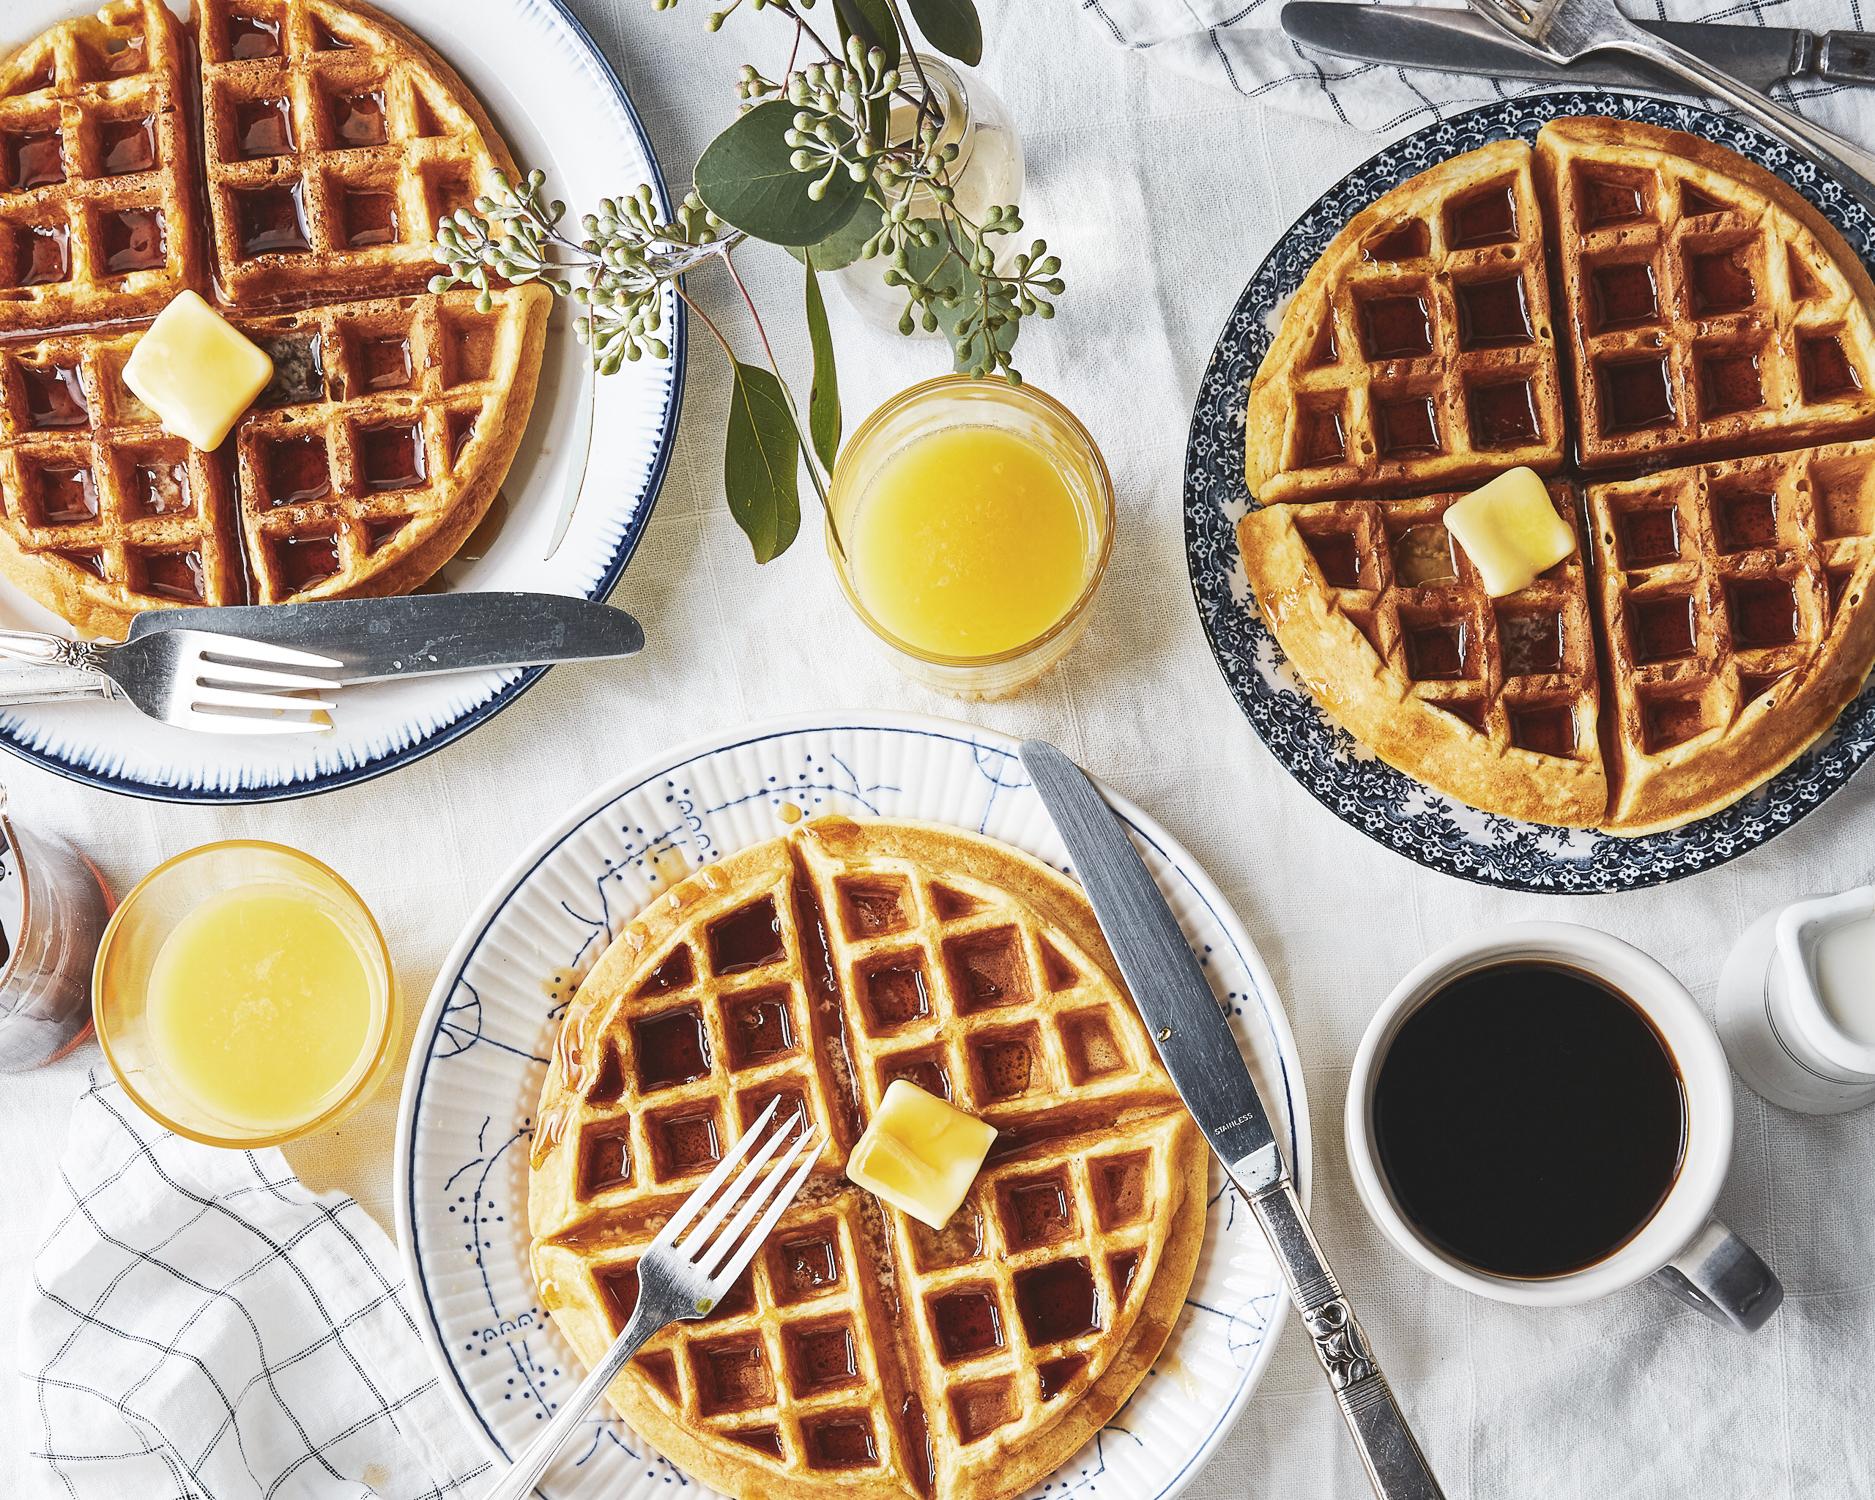 2018-1211_merrills-waffles-final-3x2_bobbi-lin_17669.jpg